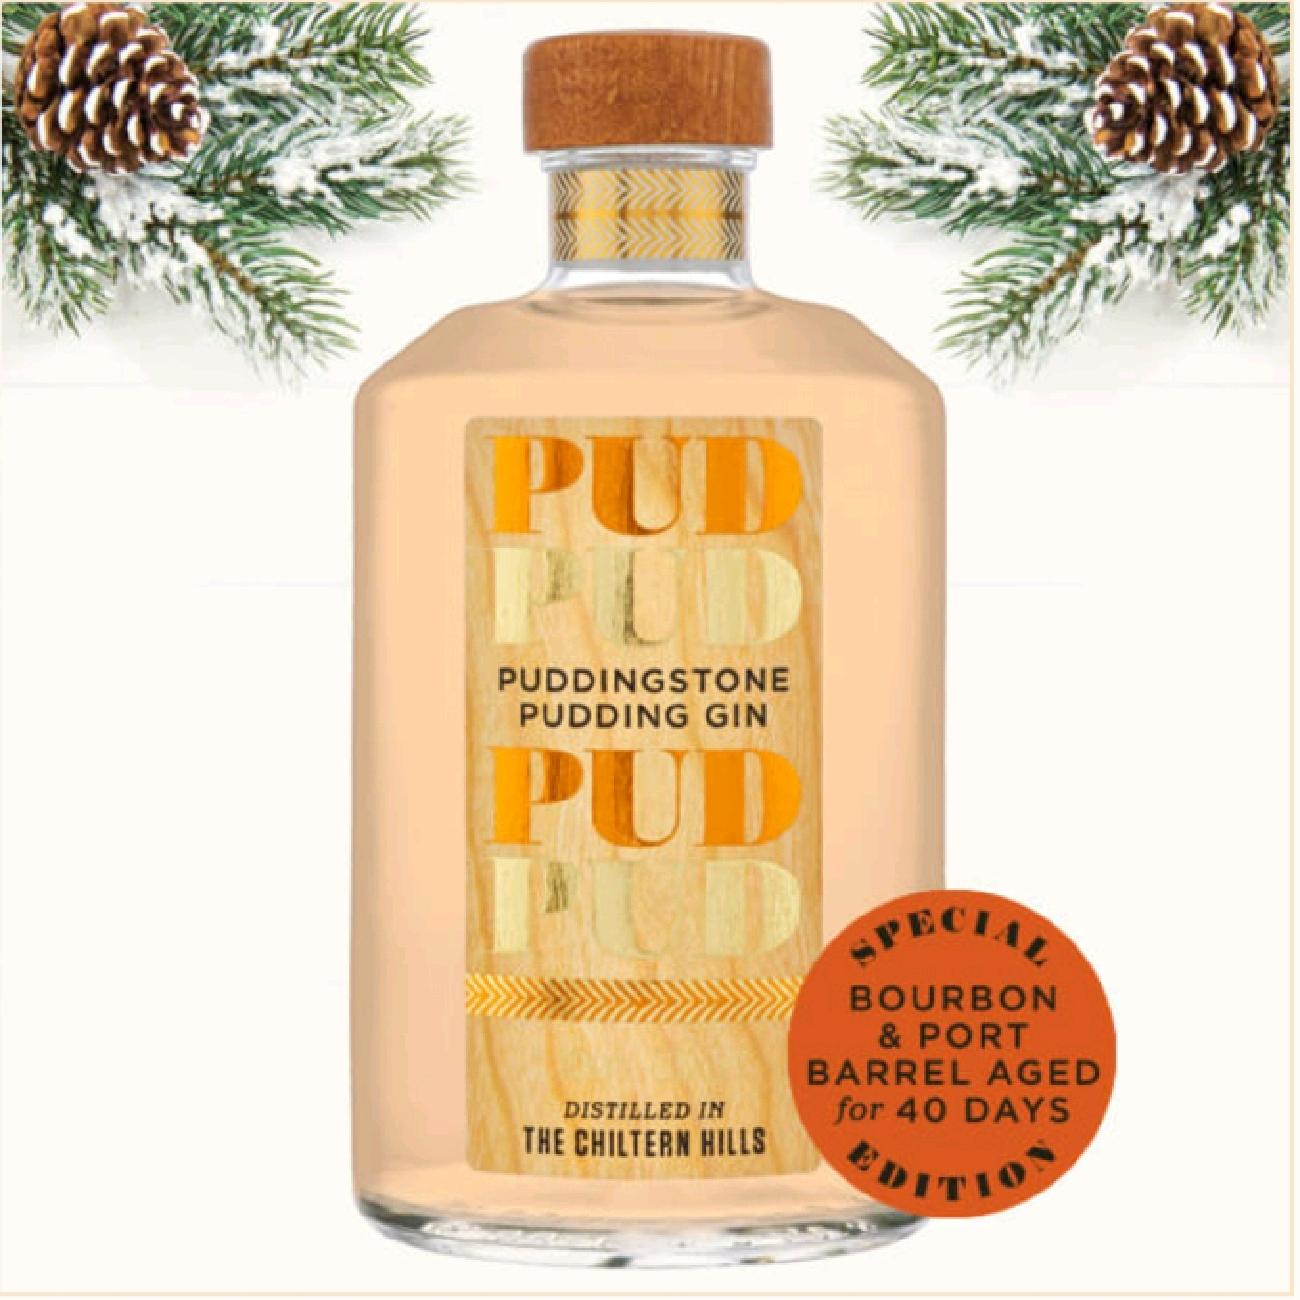 Pud Pud Cask Gin